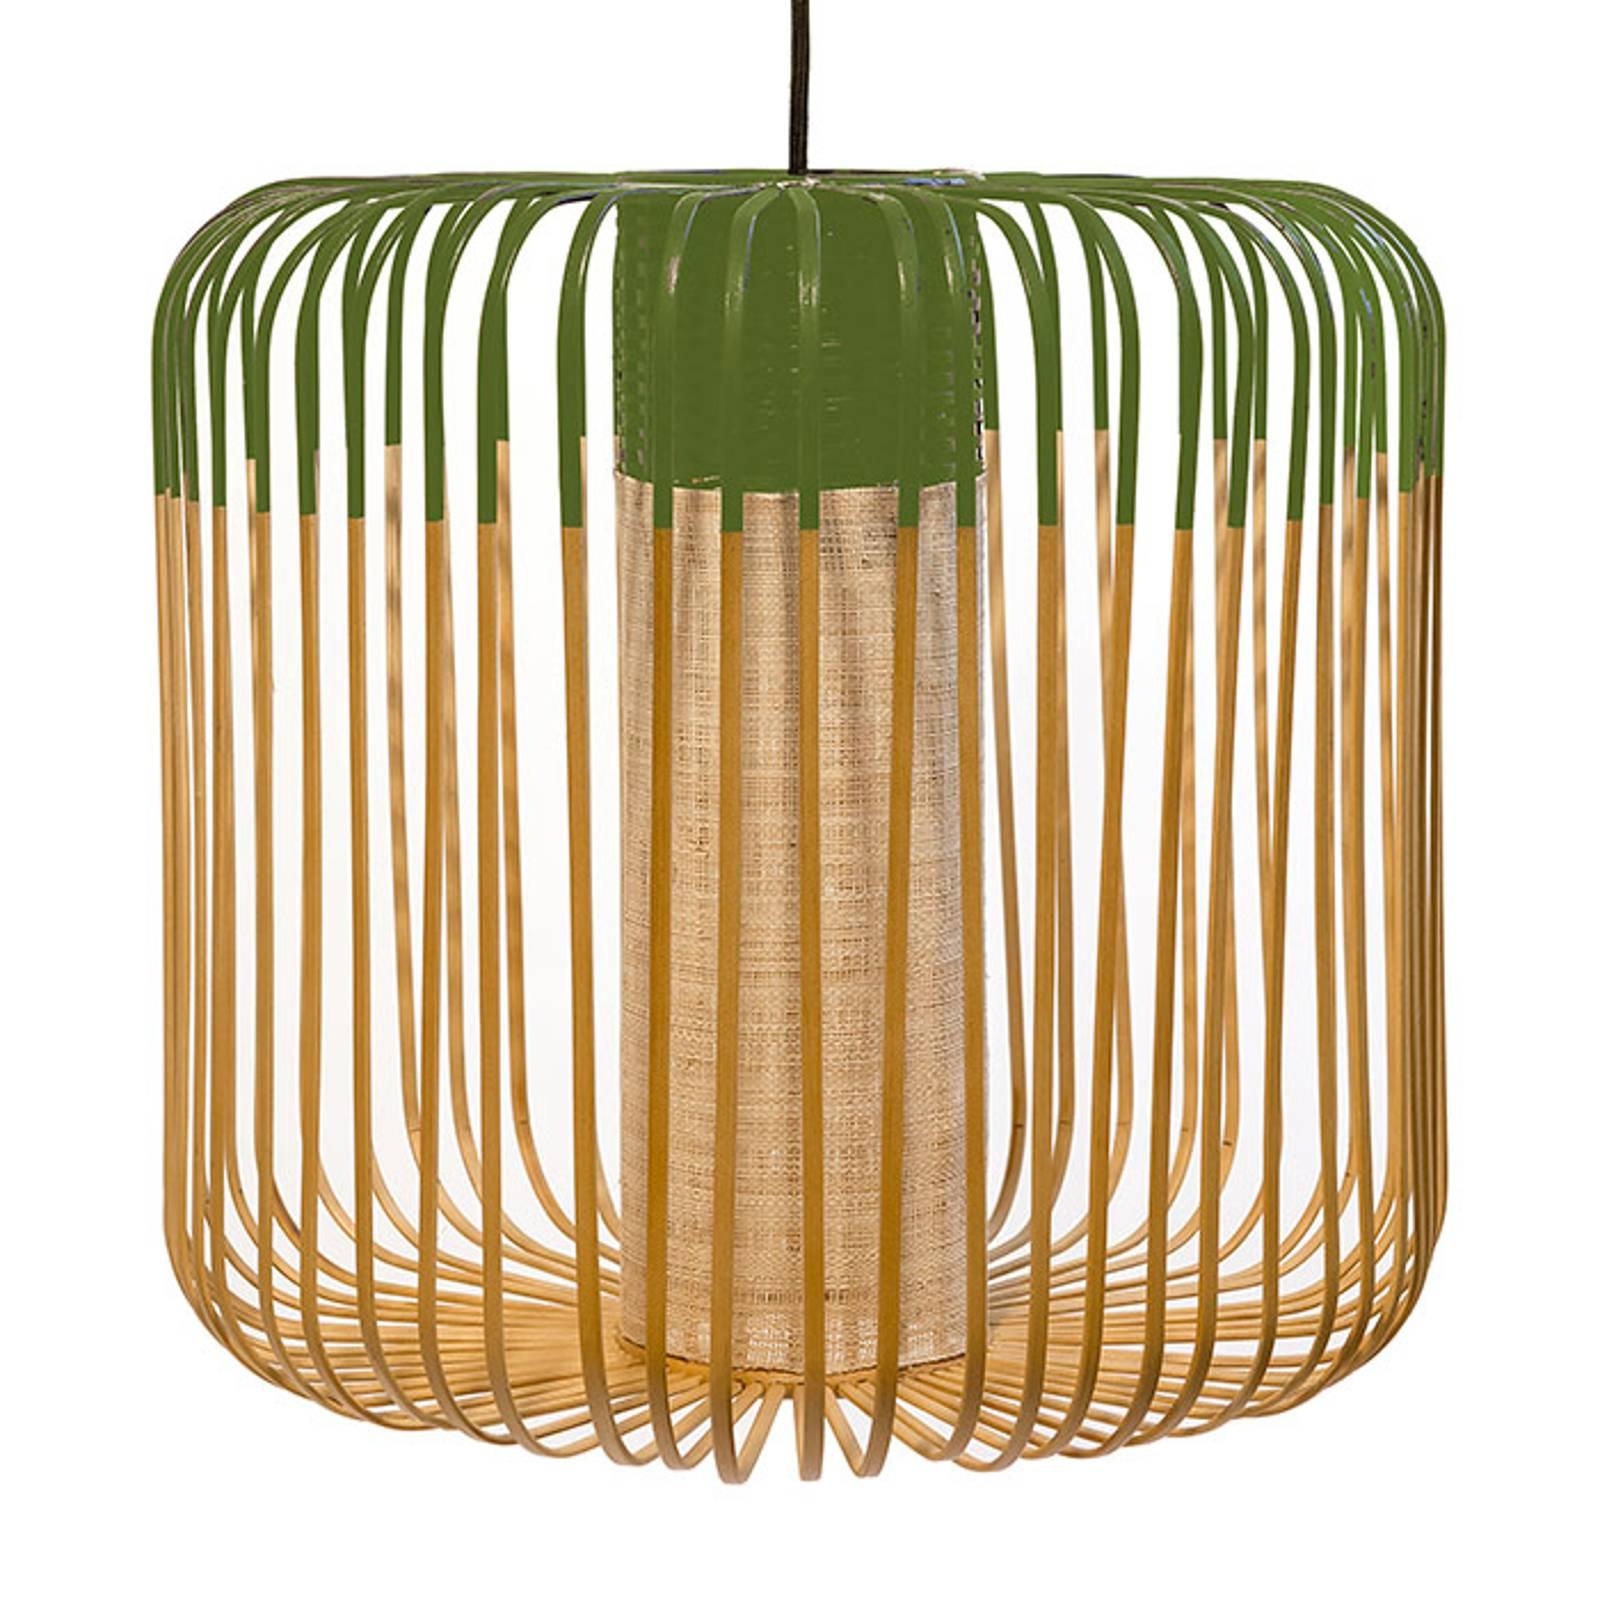 Forestier Bamboo Light M -riippuvalo 45 cm vihreä